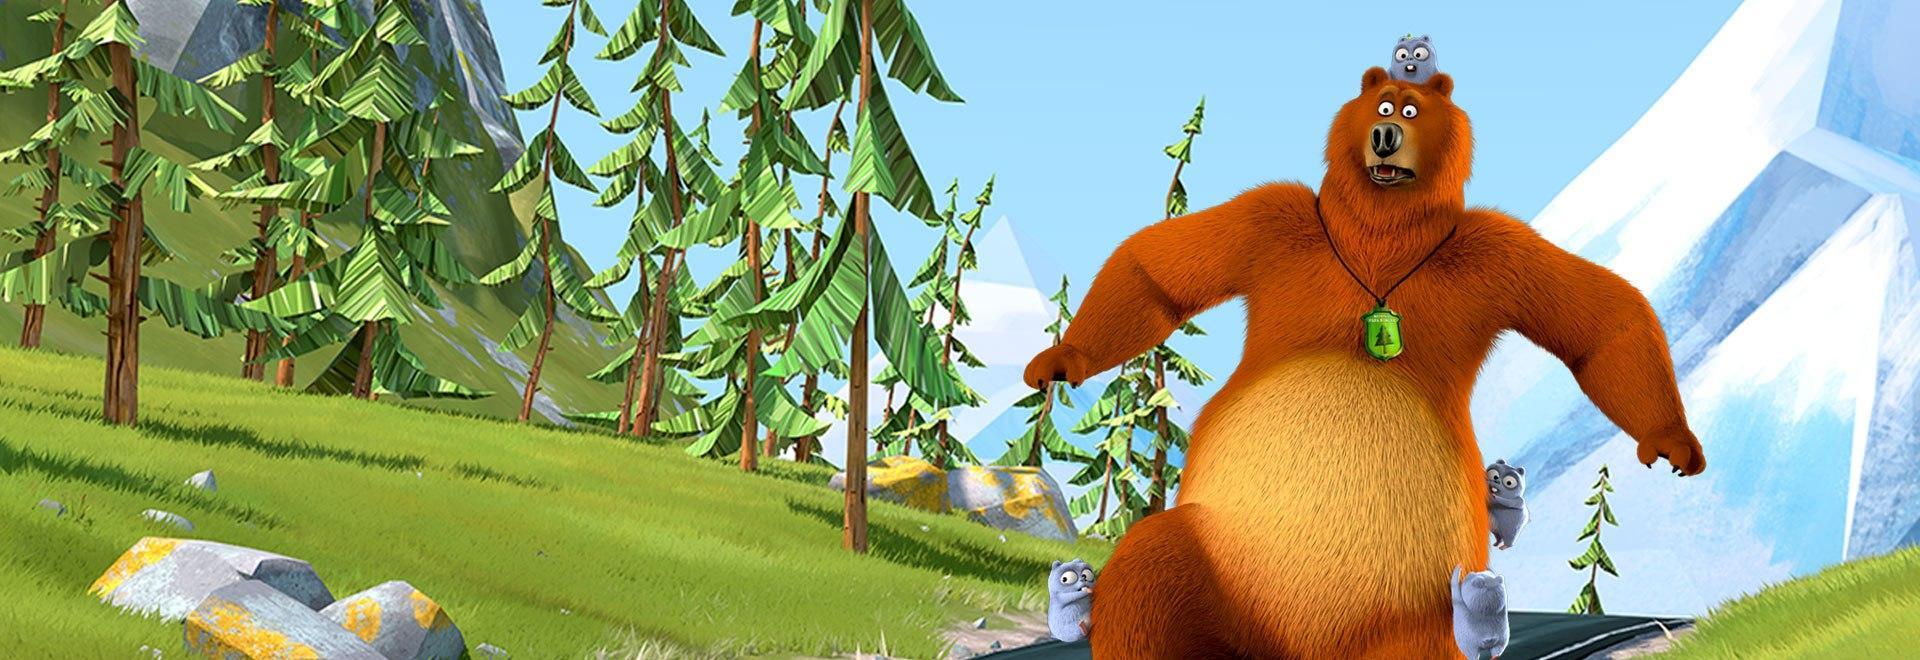 Grizzy e i Lemming: pelosi e dispettosi